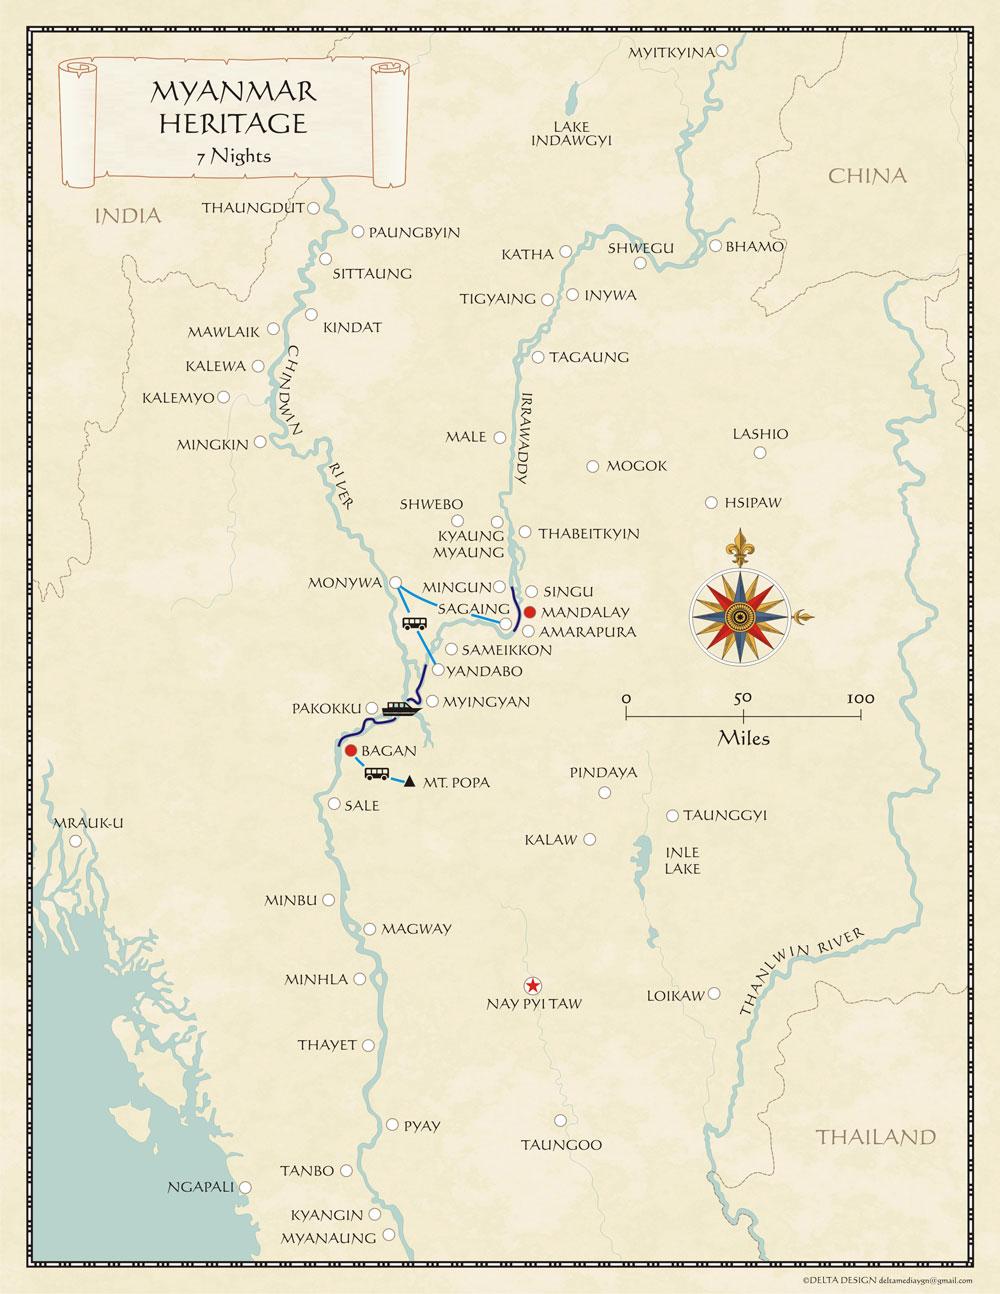 Myanmar Irrawaddy River Cruise Map